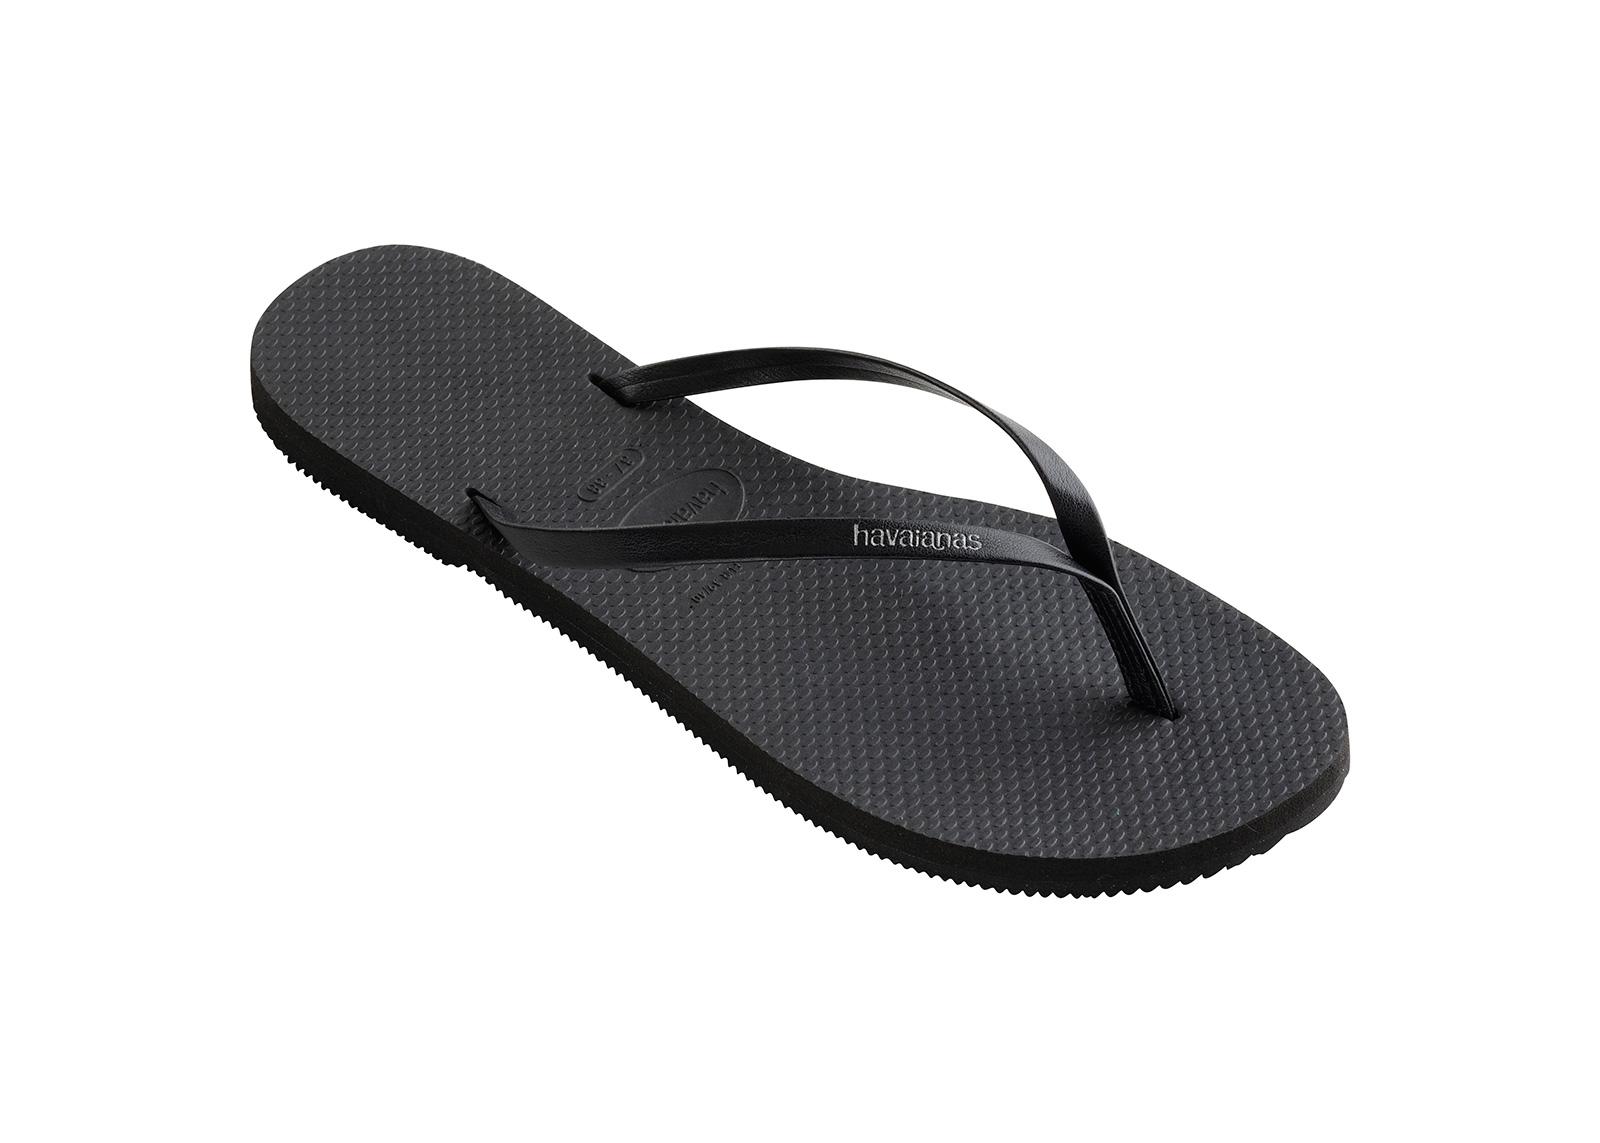 Flip-Flops Black Flip Flops - Havaianas You Black - Brand -1575